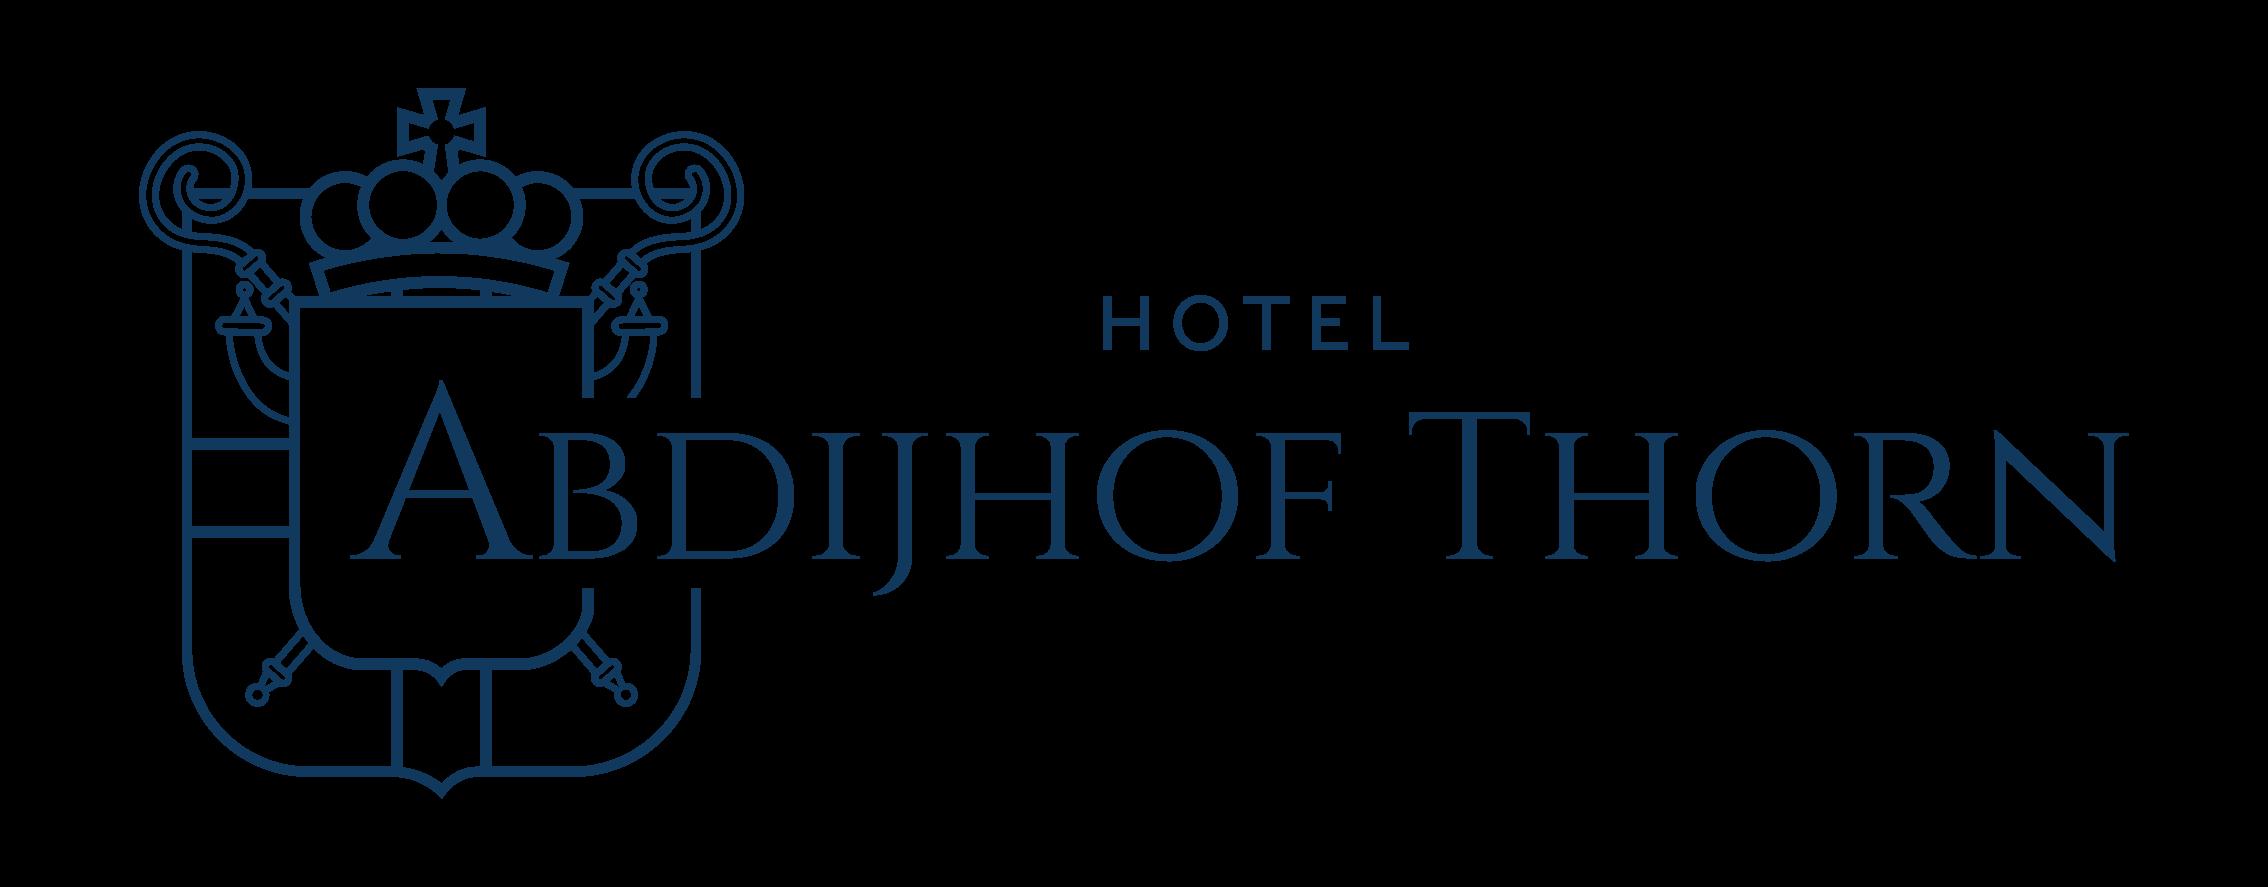 Hotel Abdijhof Thorn